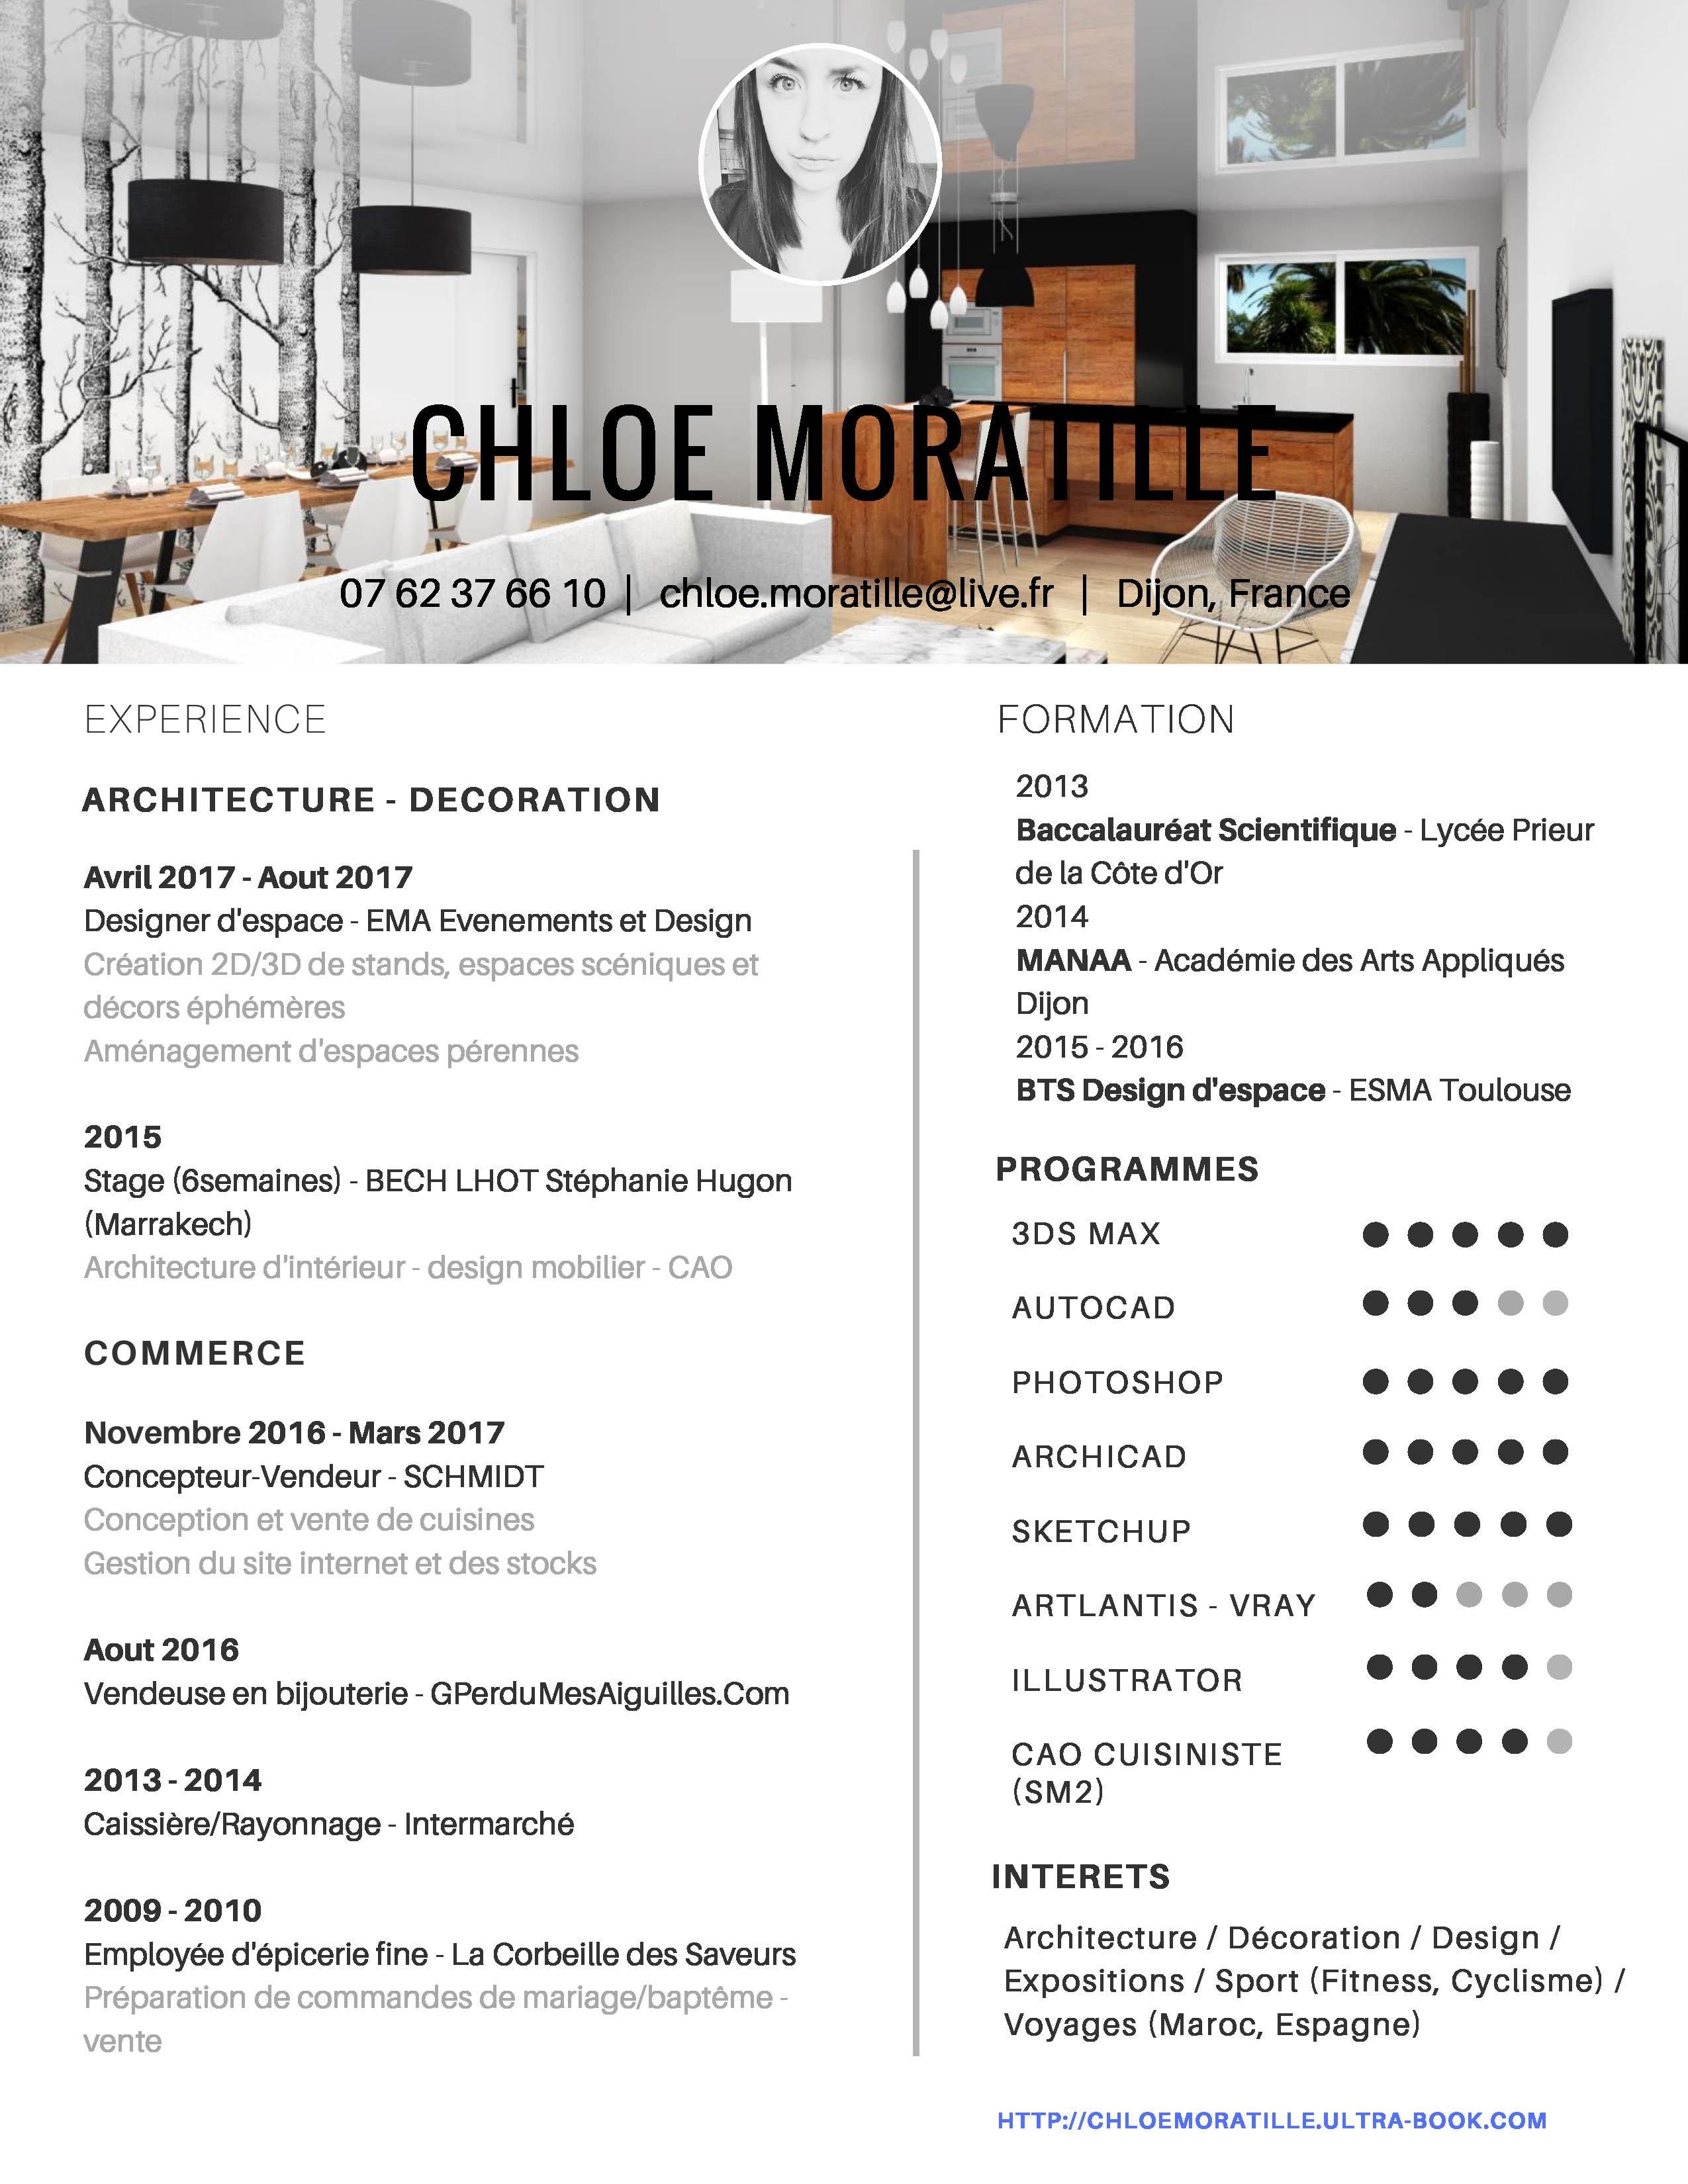 Design D Espace Toulouse ultra-book de chloemoratillebio :